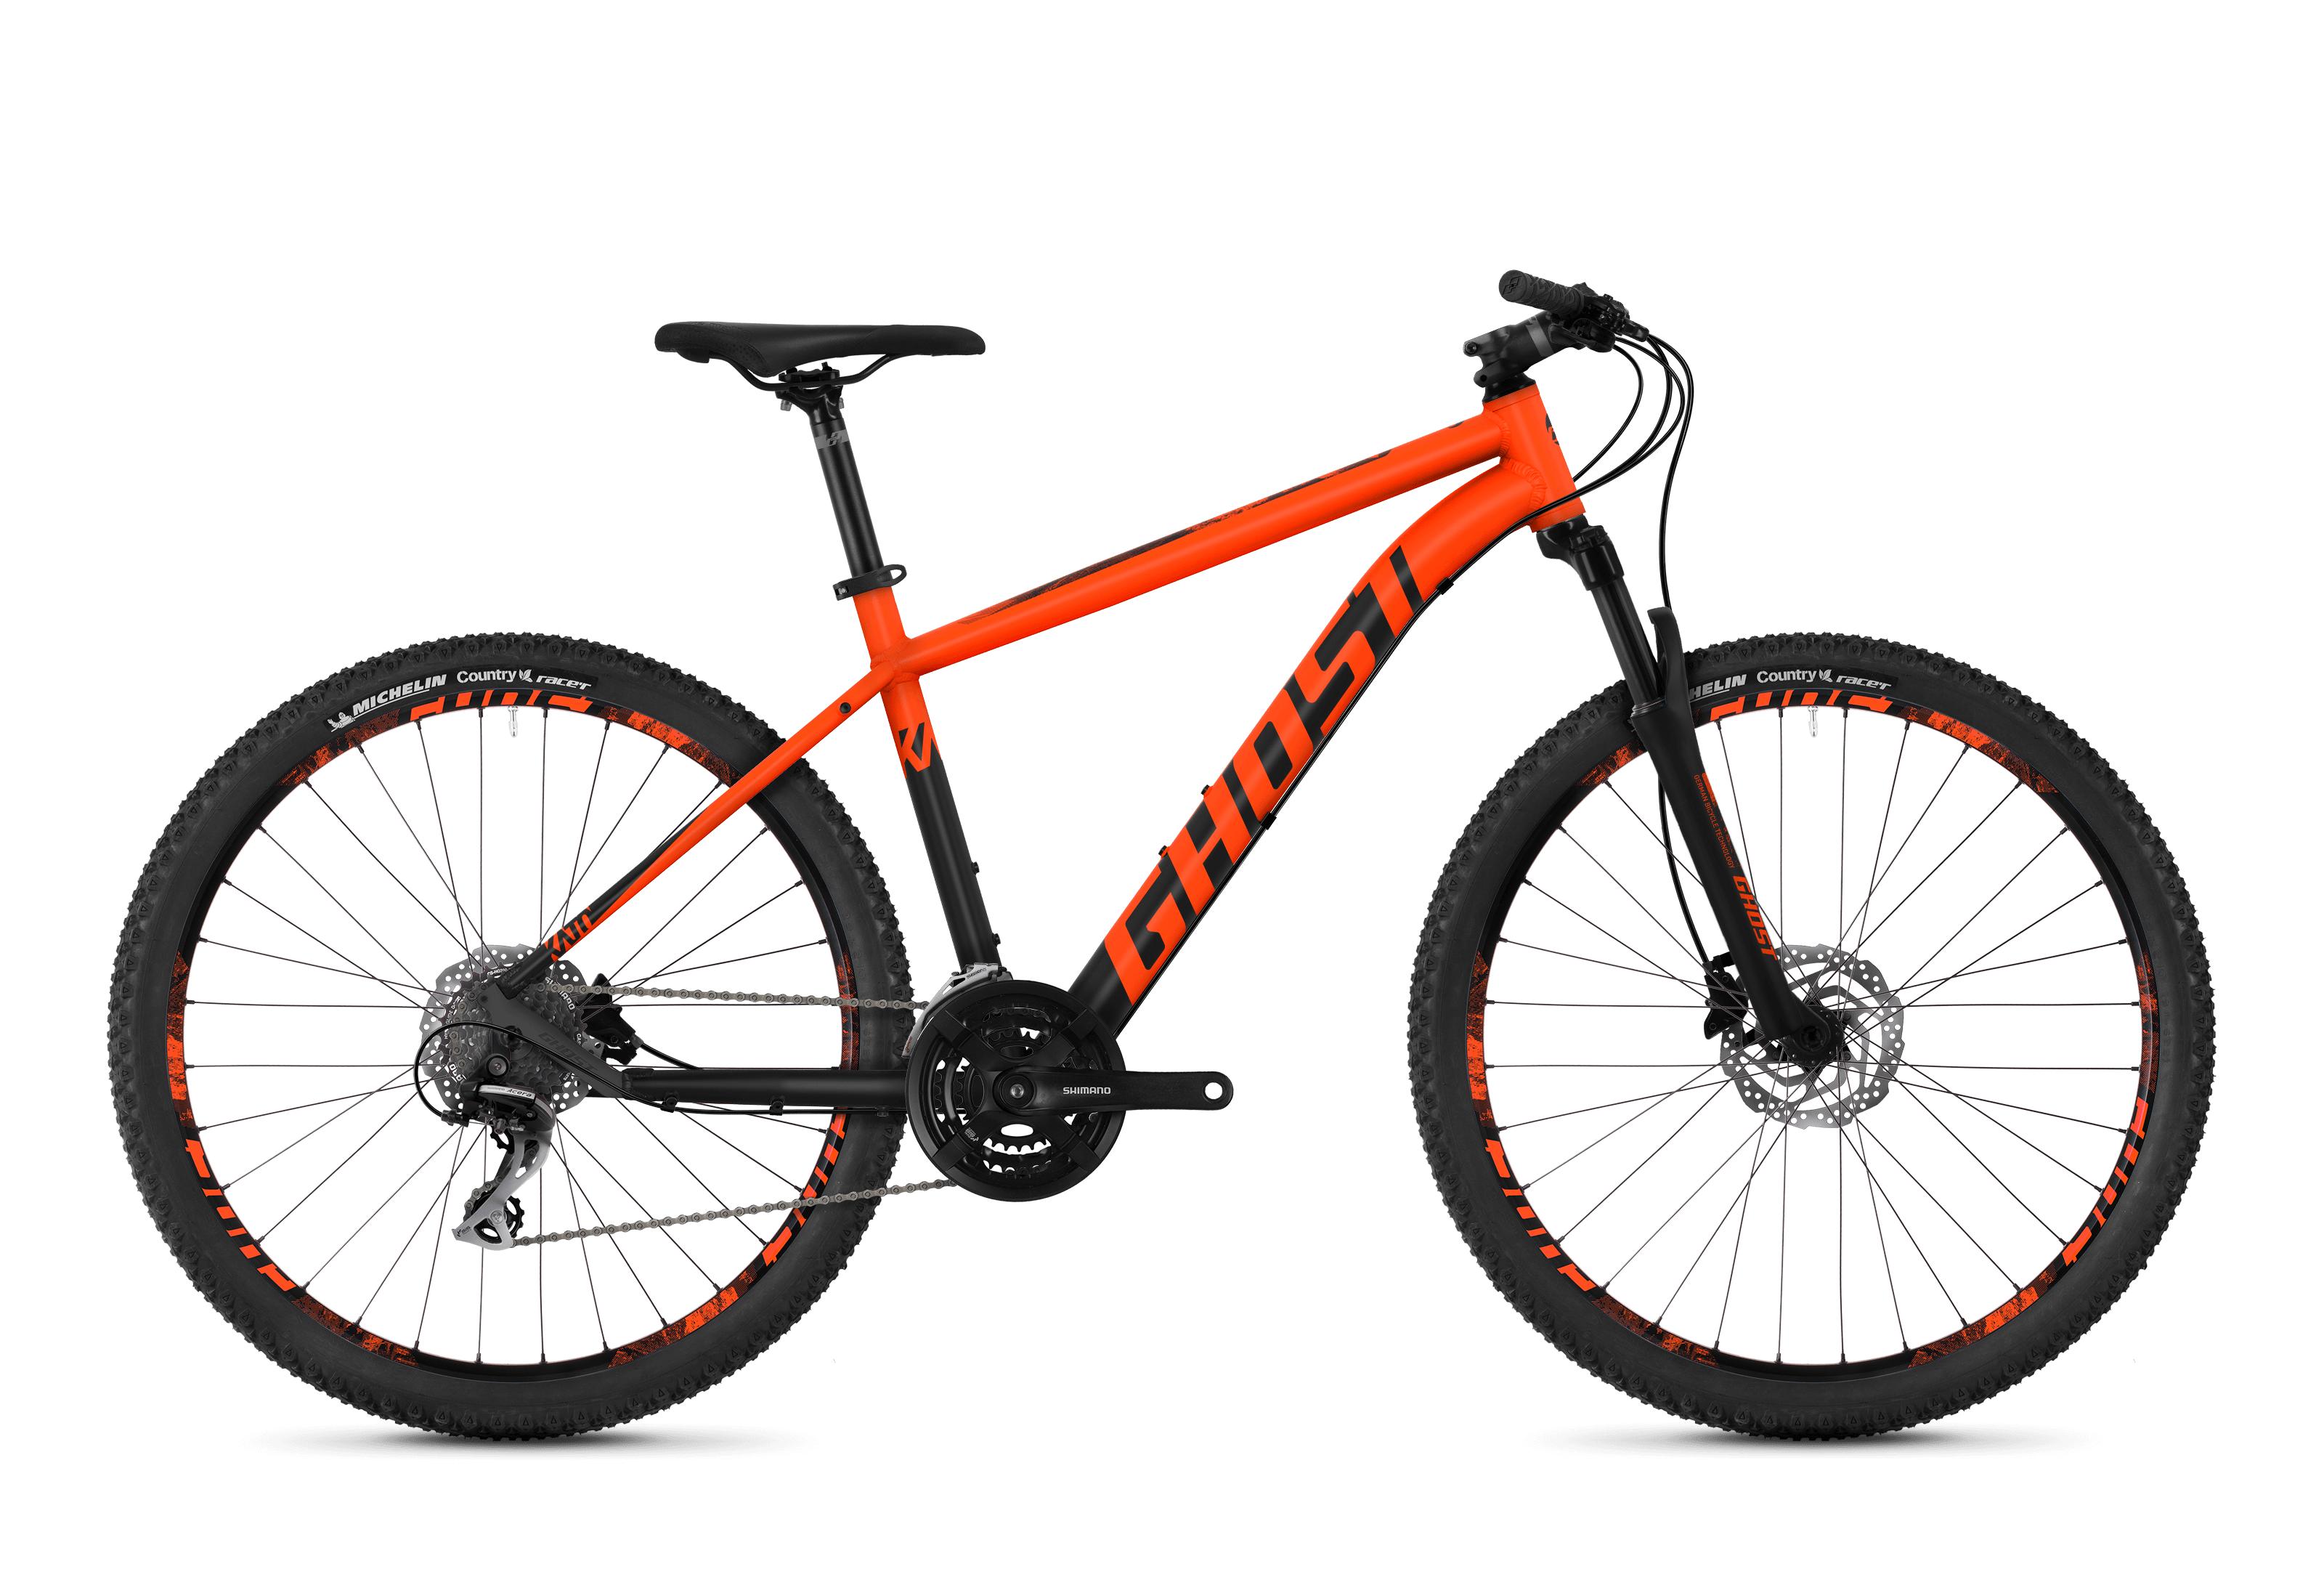 Horské kolo GHOST Kato 3.7 orange / black XS 2018